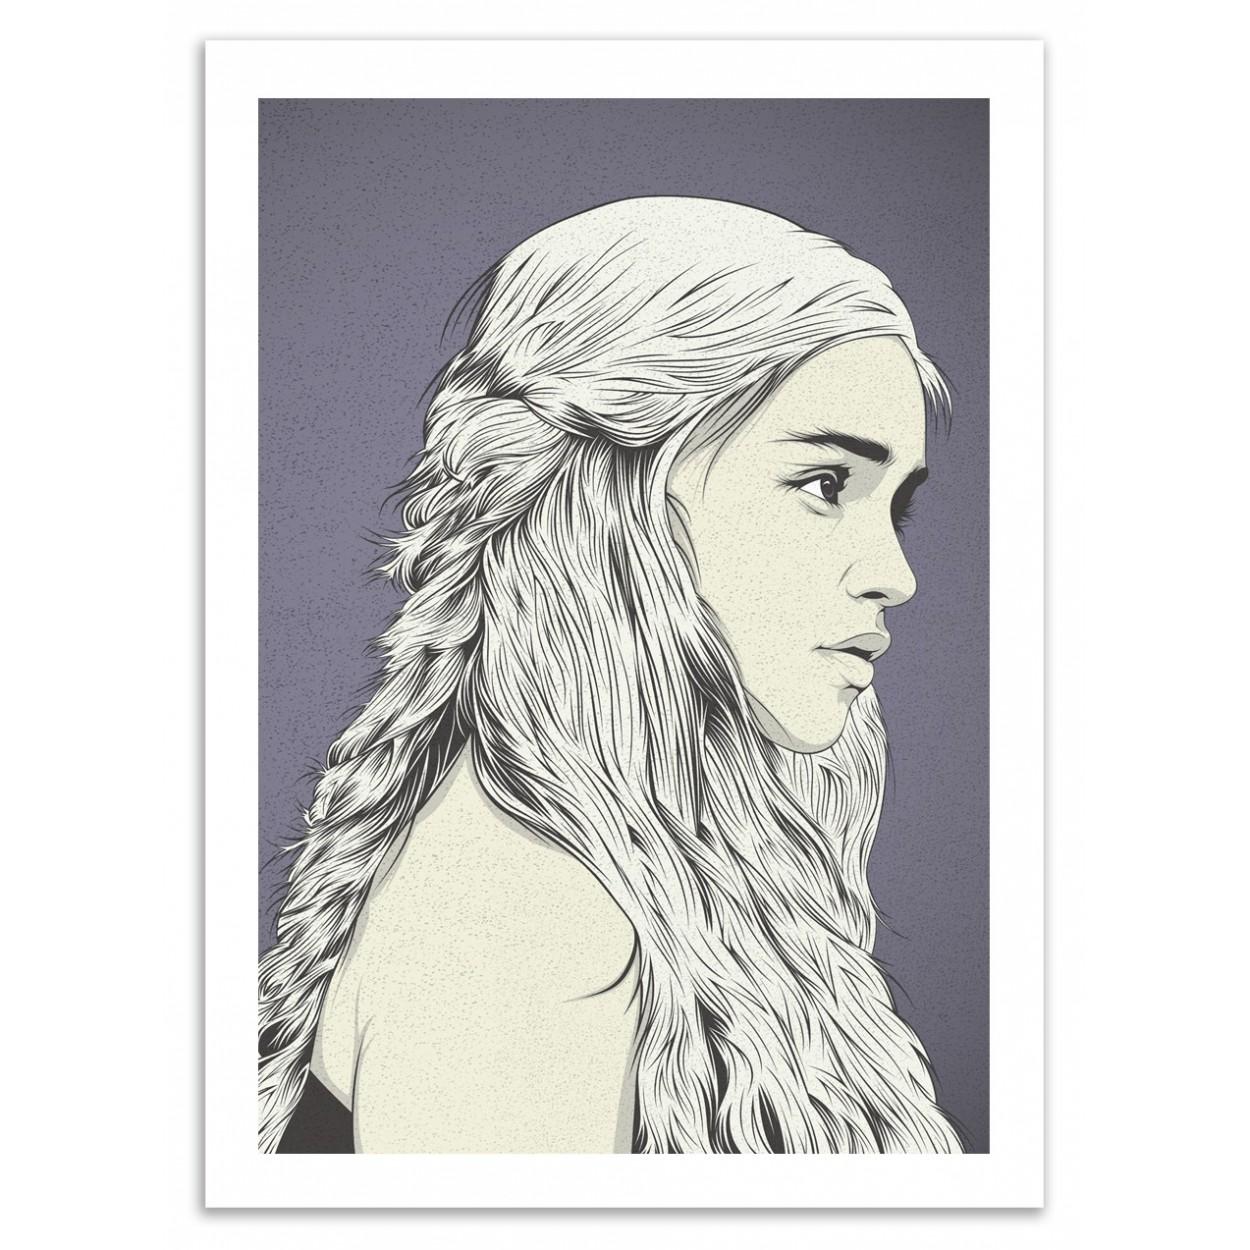 Khaleesi Art Poster (Game of Thrones) x Cranio Dsgn